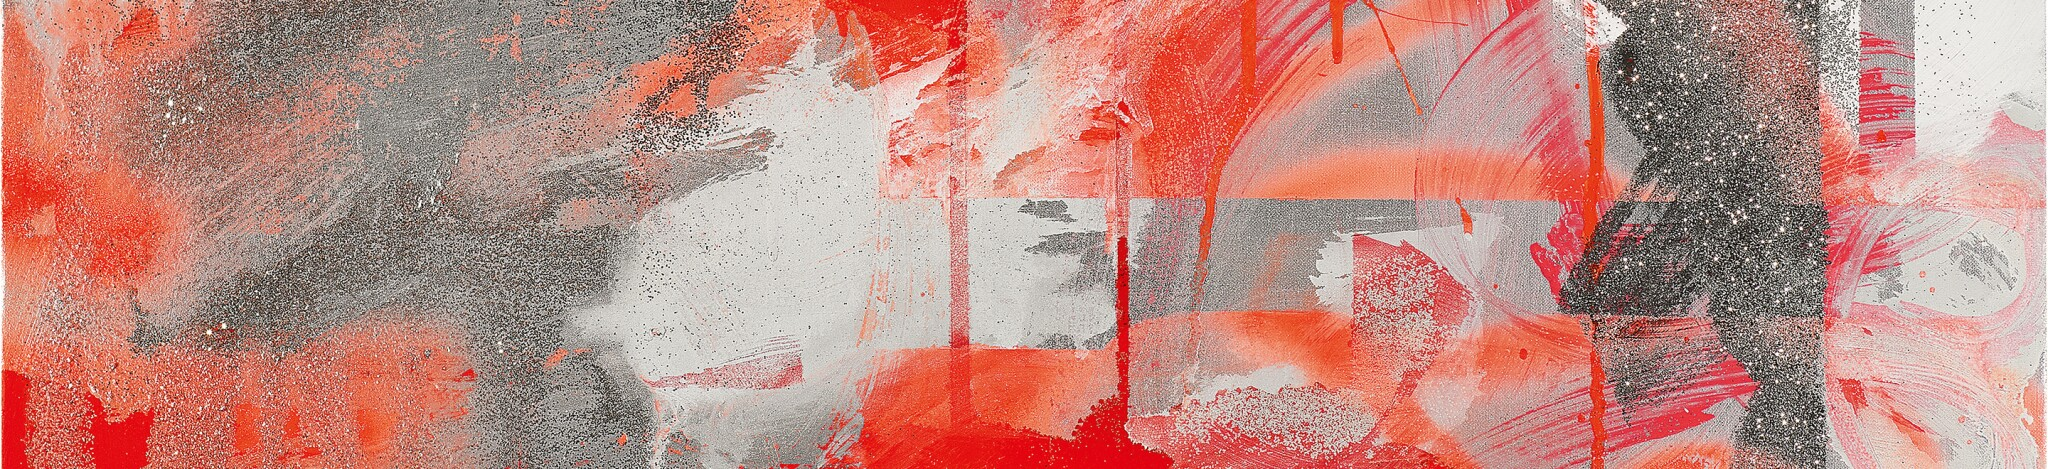 Contemporary Art Online | New York